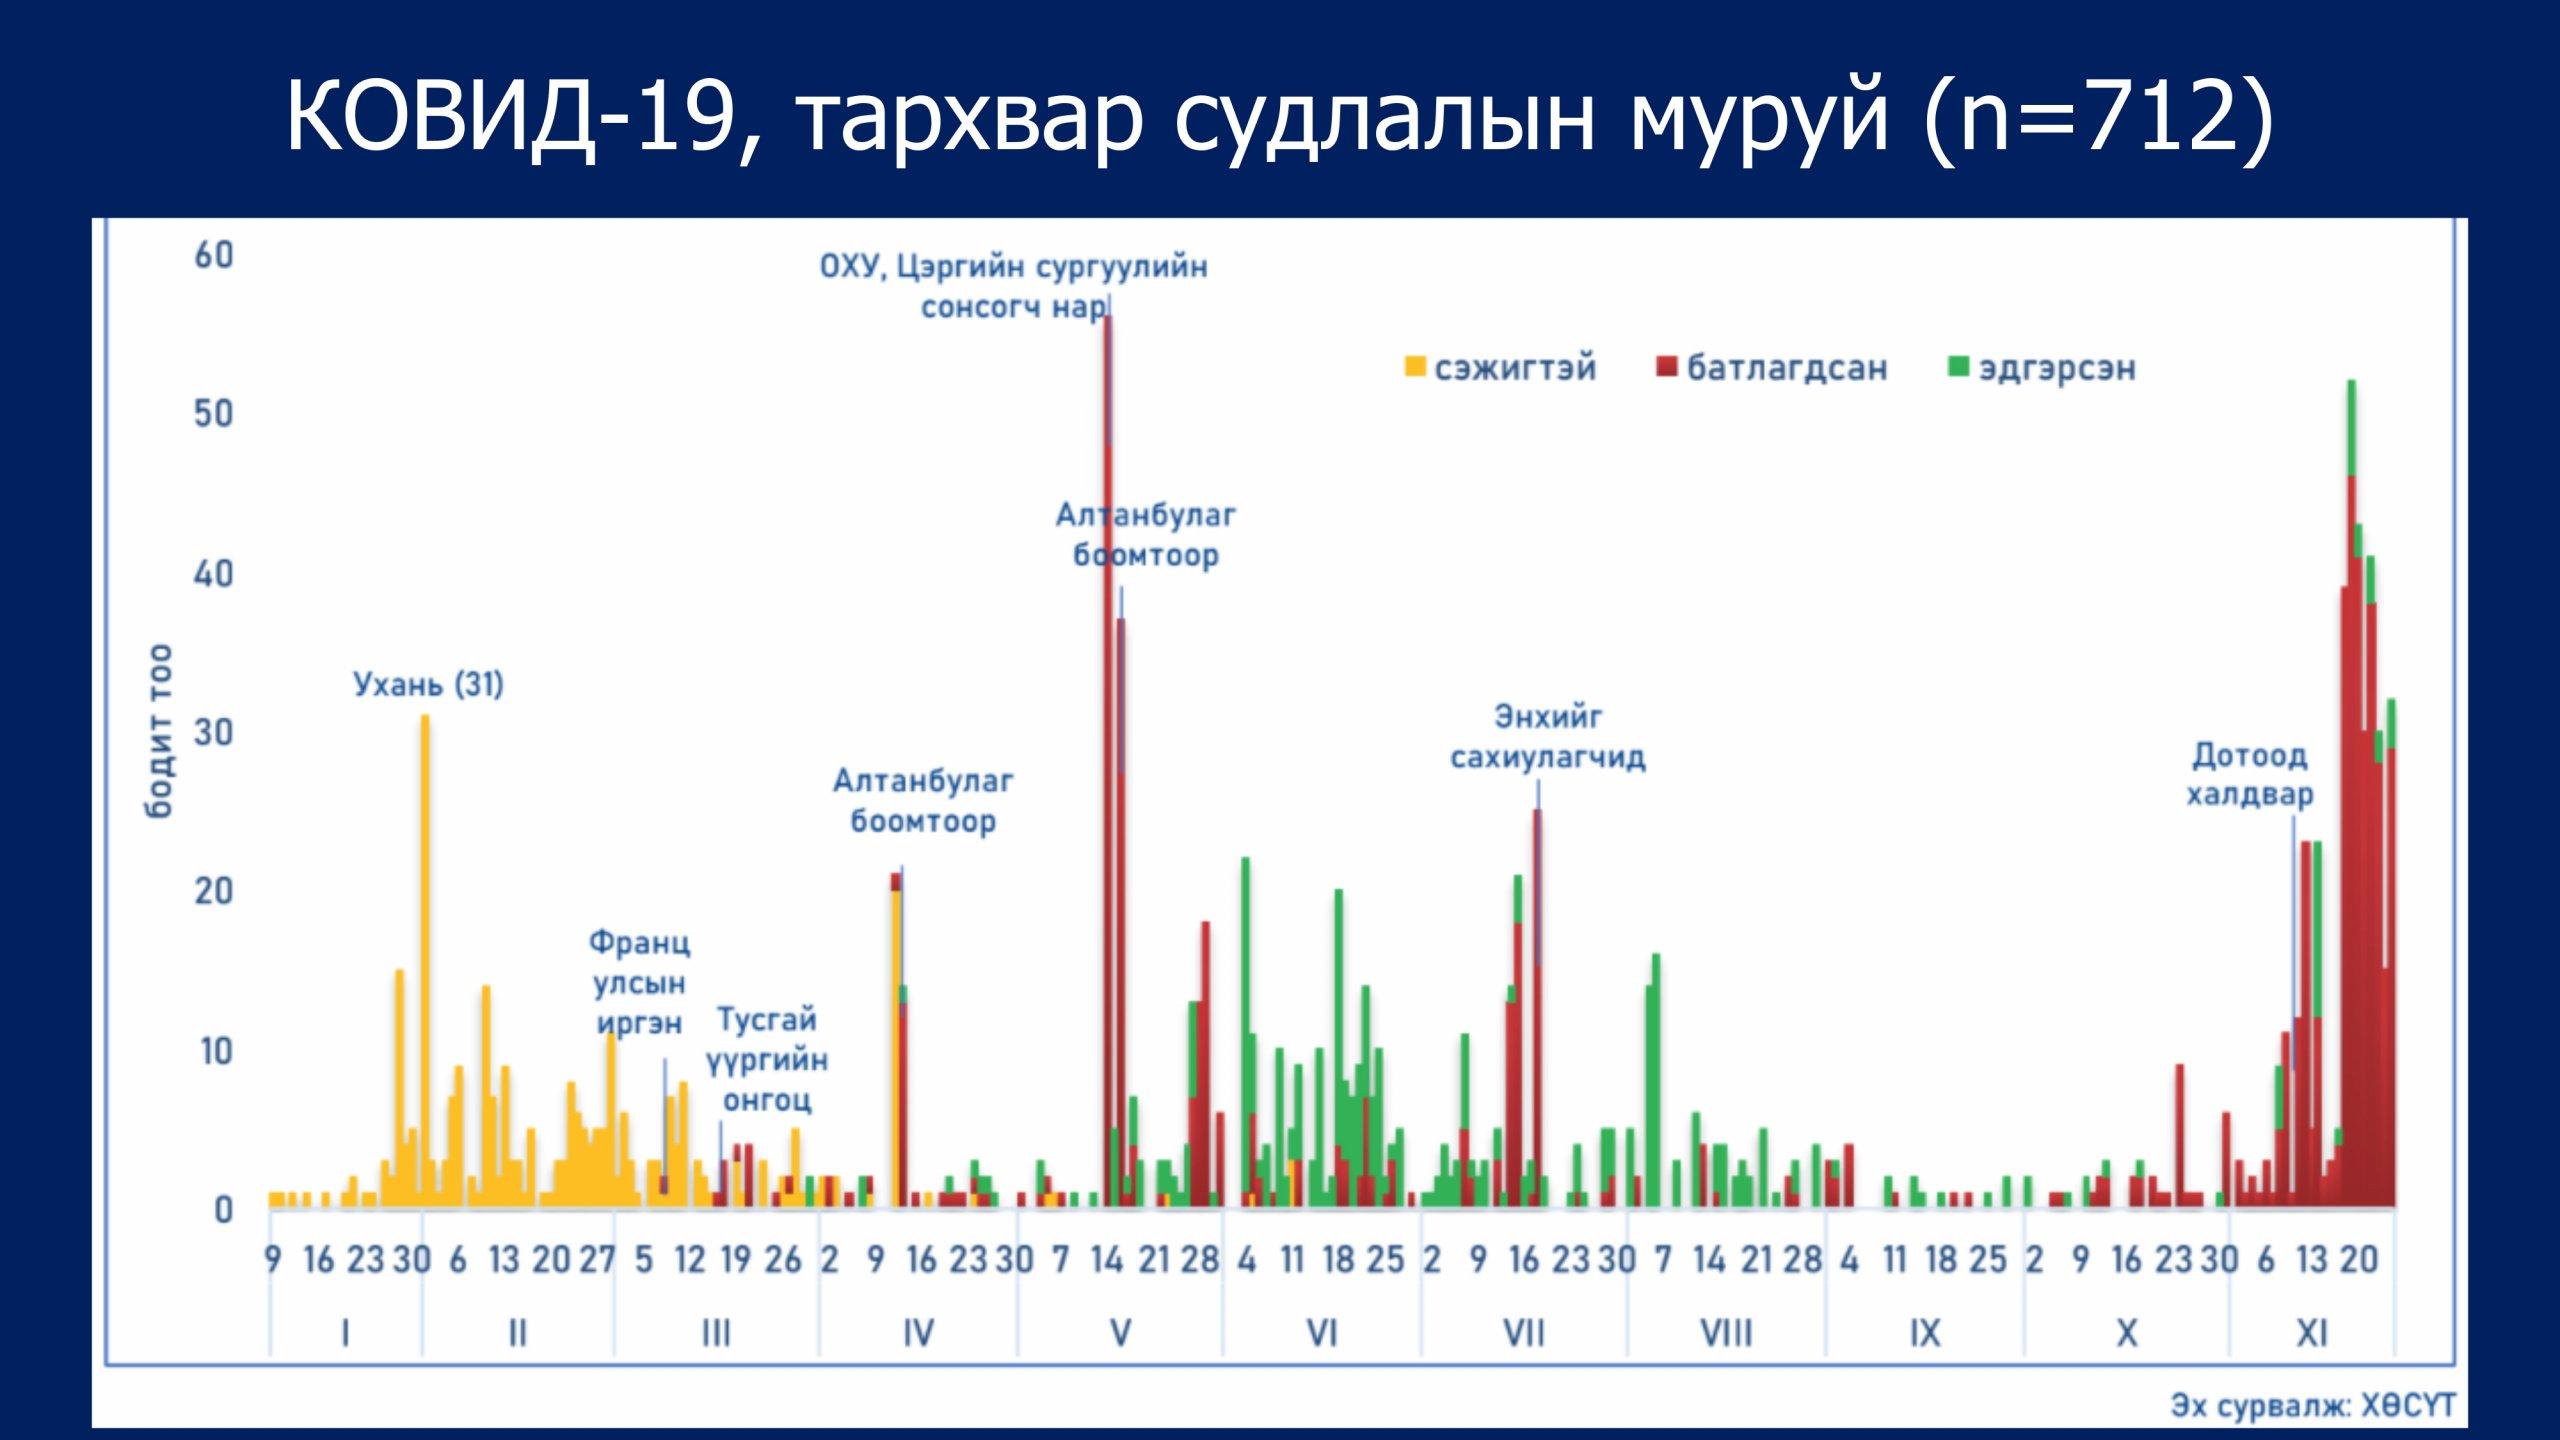 PPT-2020.11.26-9